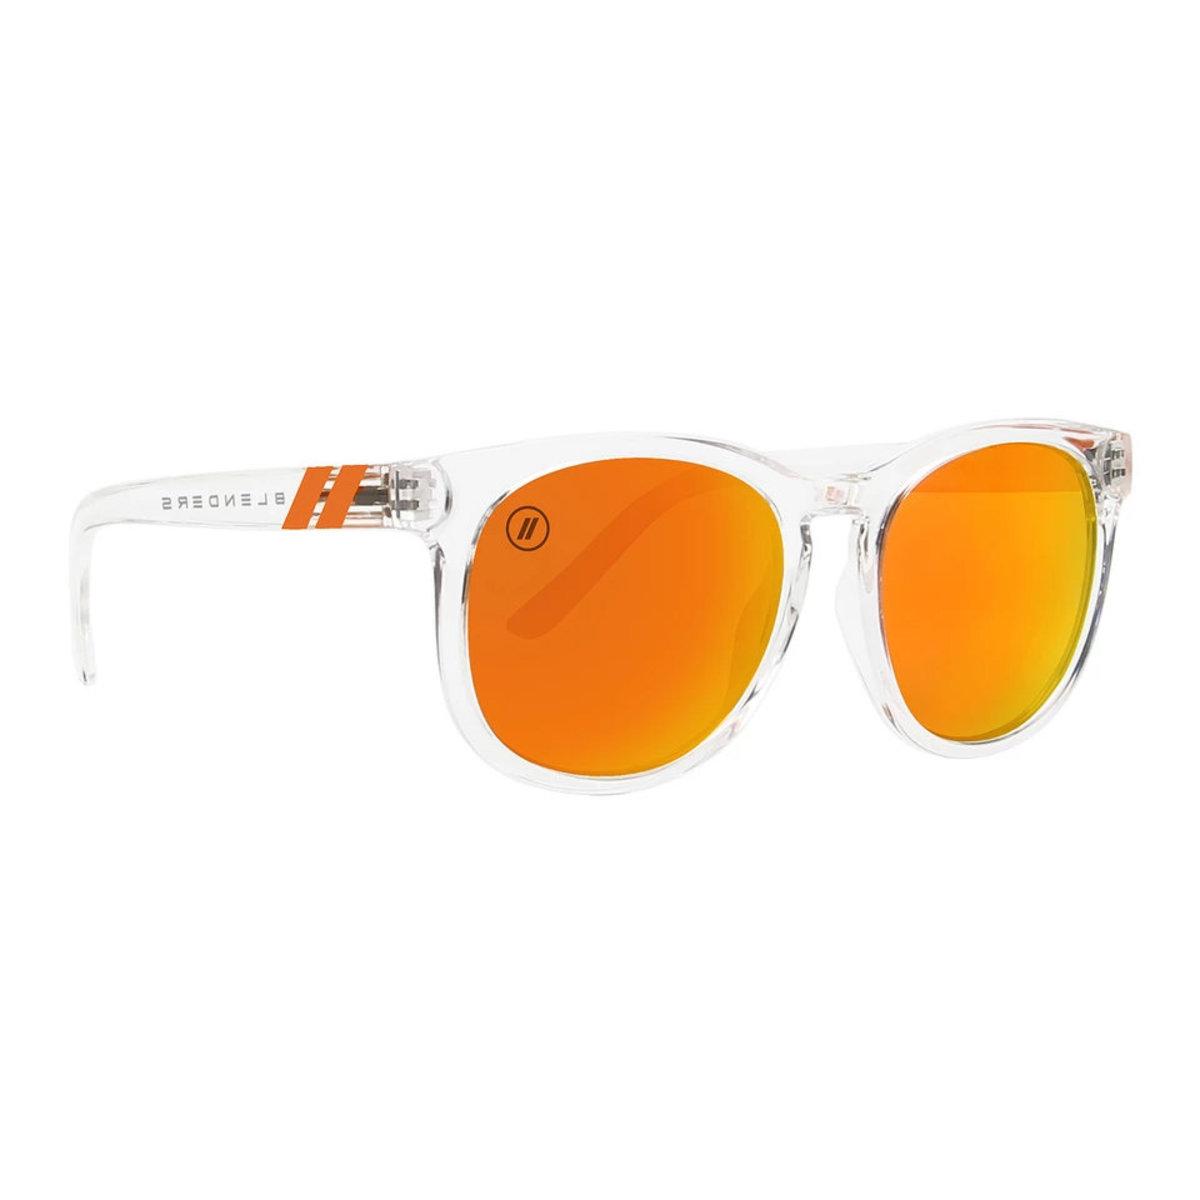 H Series // 偏光鏡片橙色太陽眼鏡